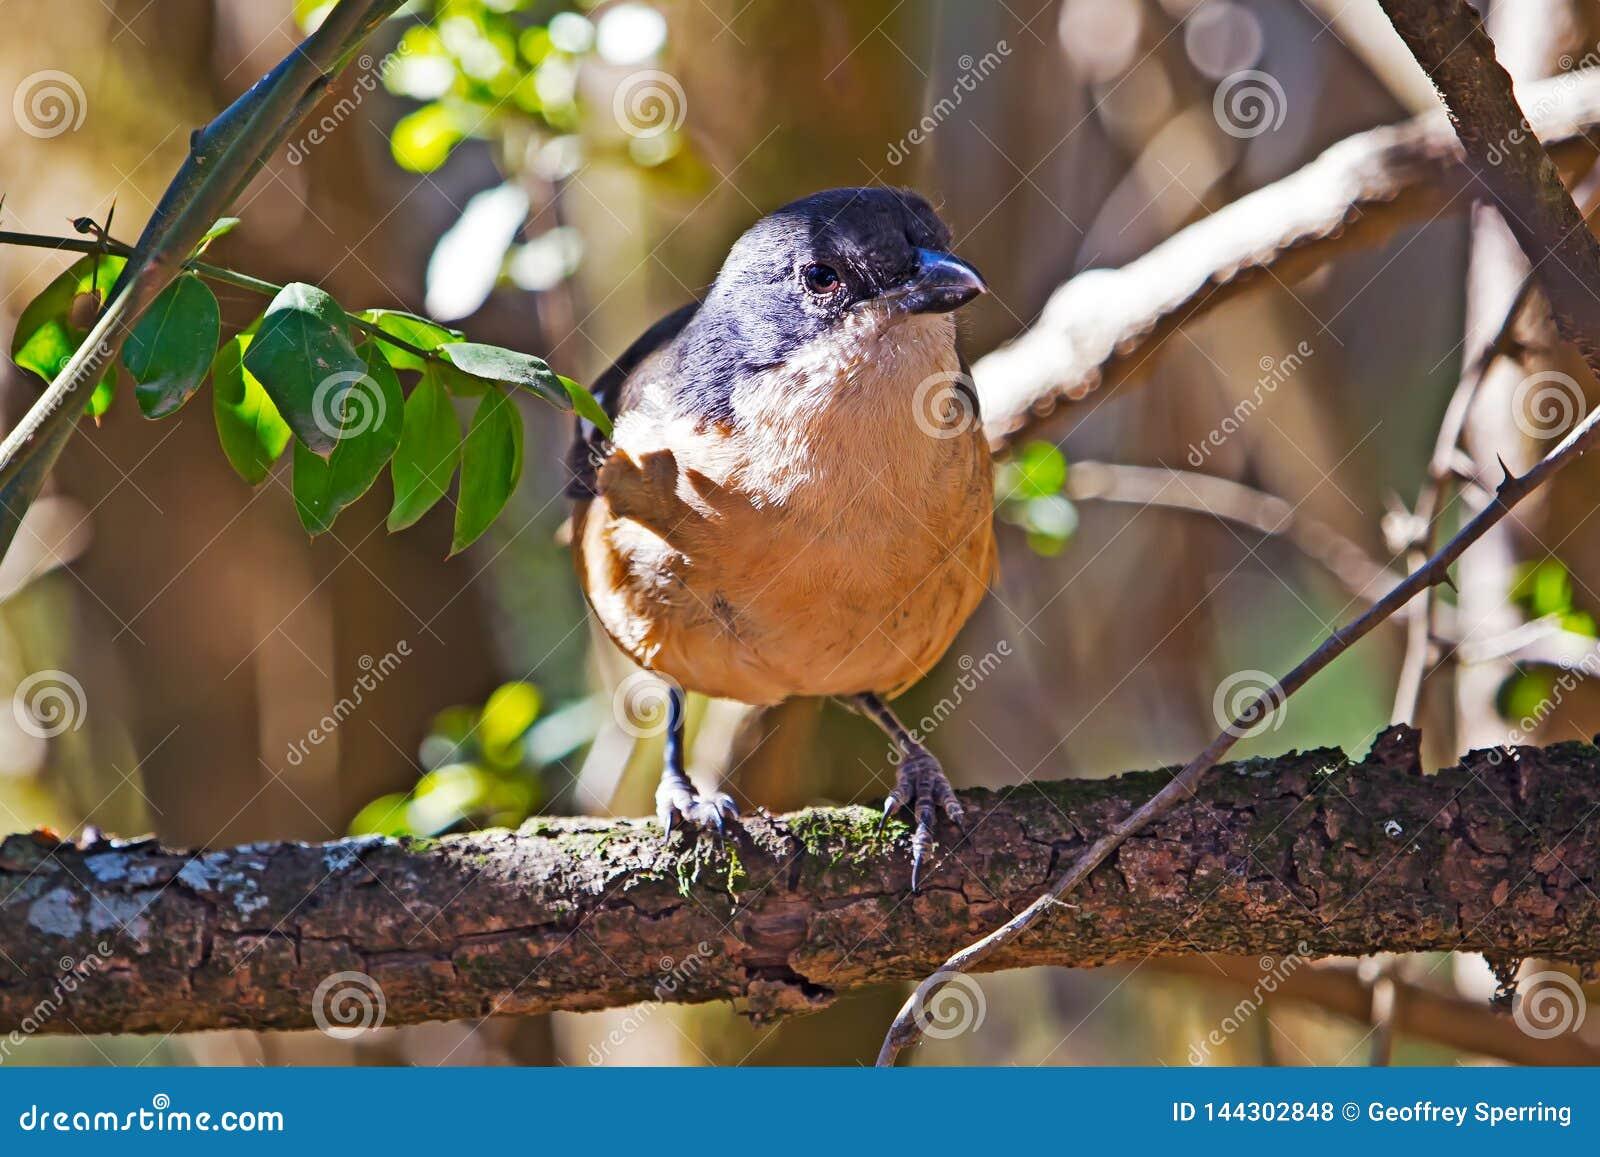 Pájaro fiscal común del alcaudón encaramado en rama de árbol